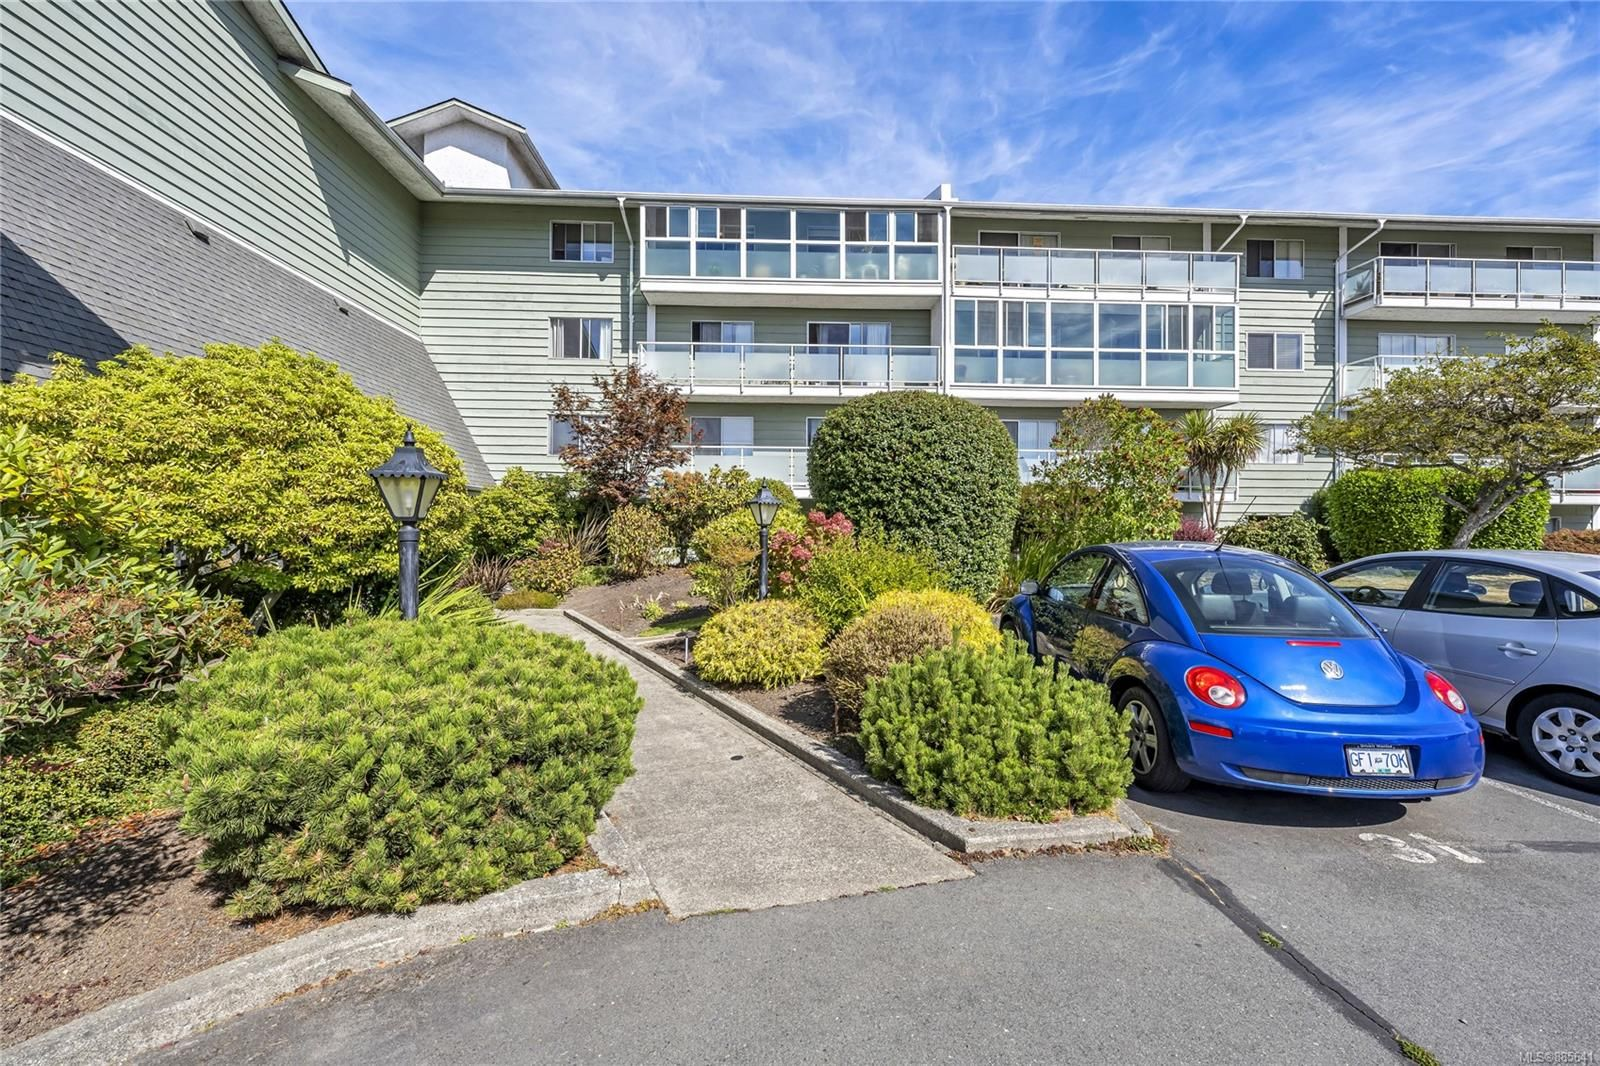 Main Photo: 407 1490 Garnet Rd in : SE Cedar Hill Condo for sale (Saanich East)  : MLS®# 885641